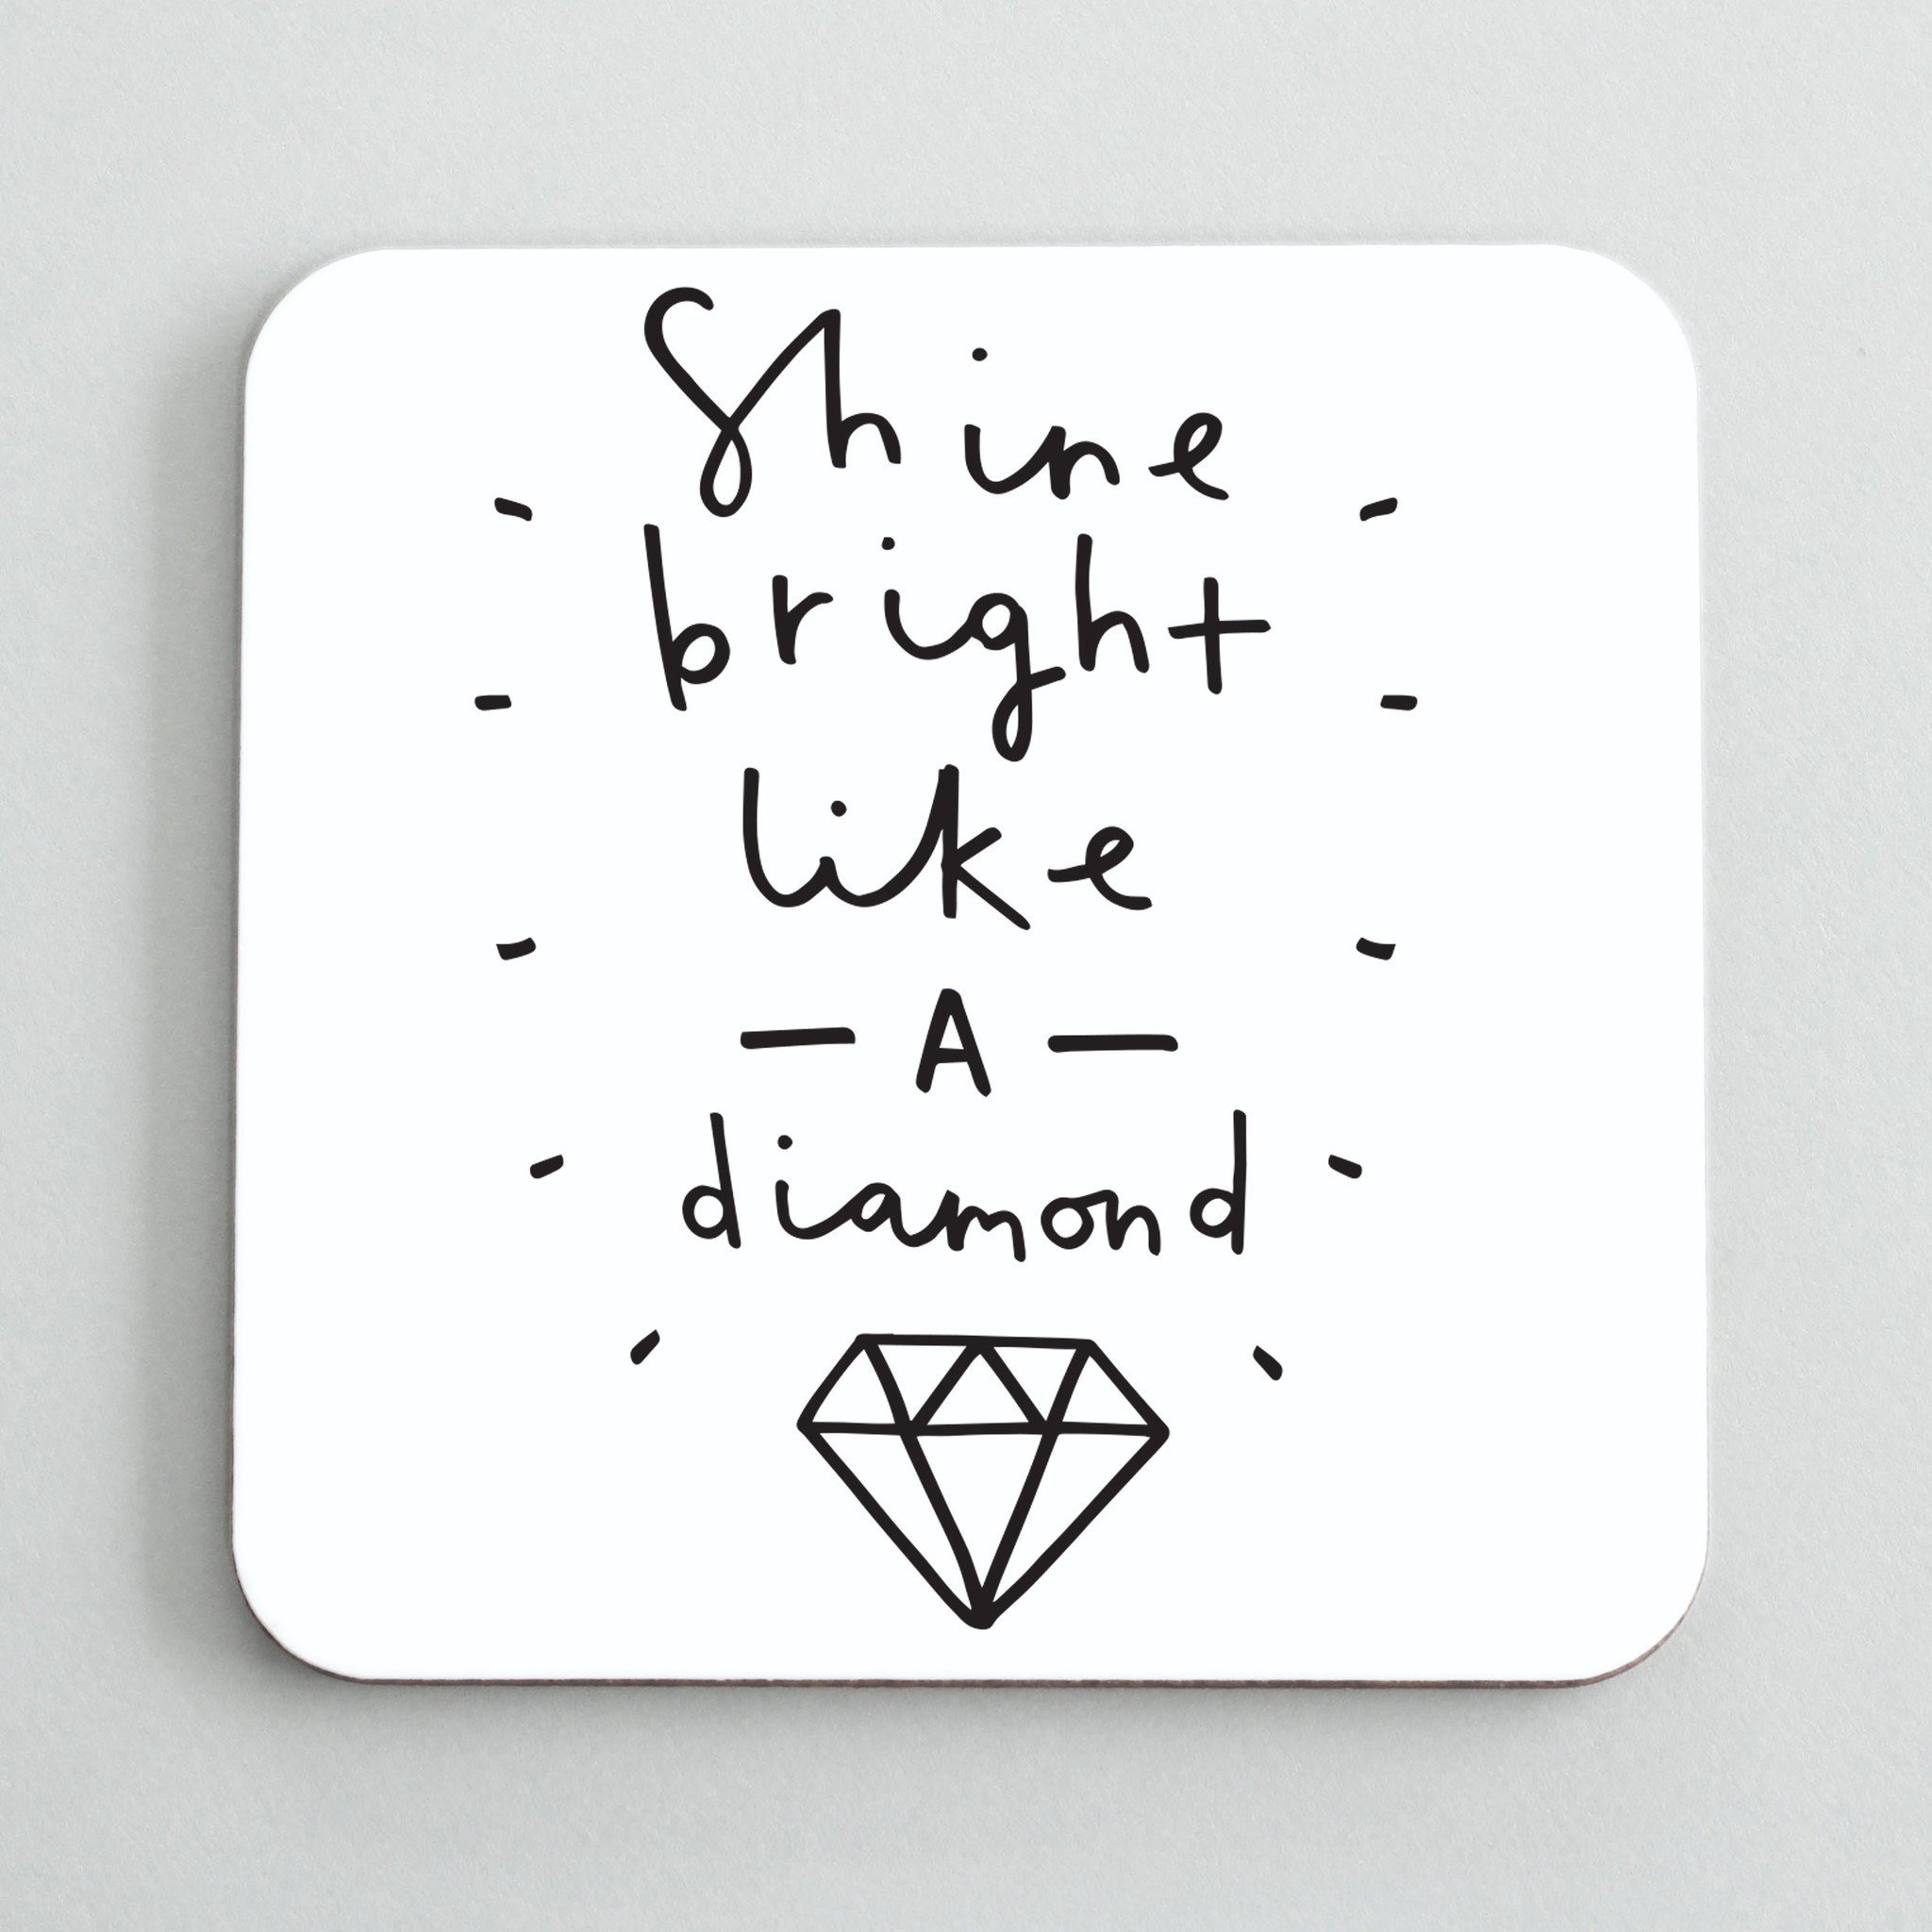 shine-bright-like-a-diamond-coaster.jpg